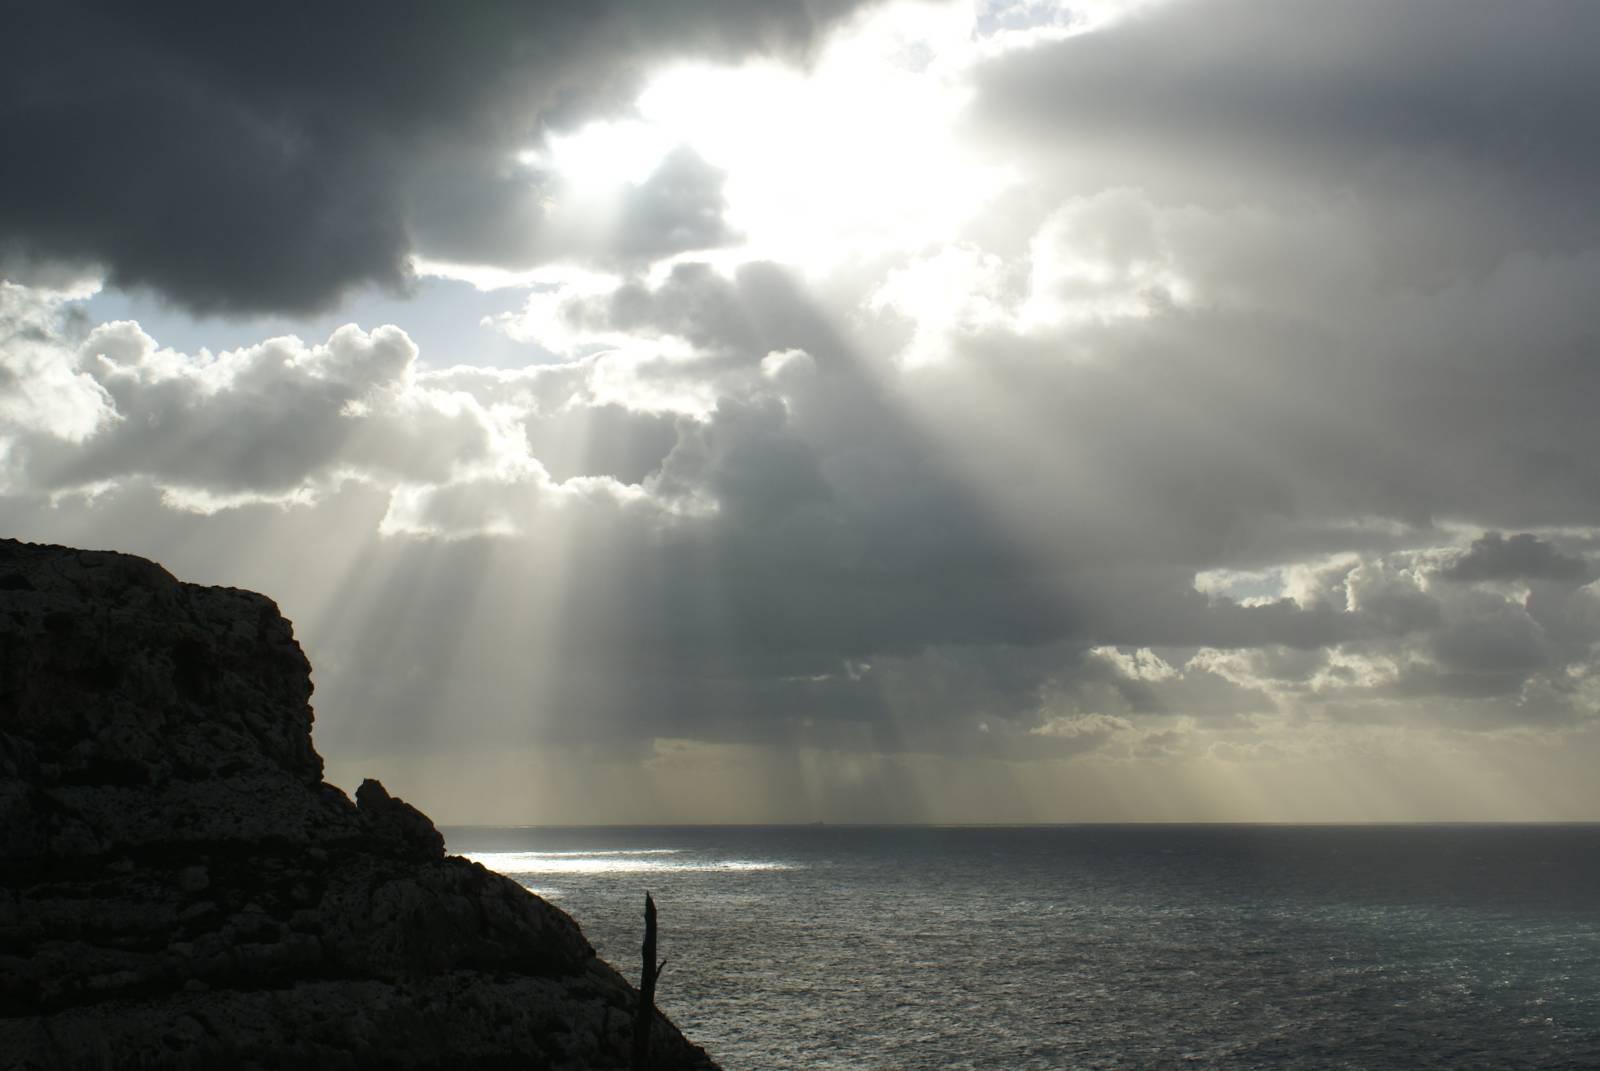 Sunlight shining through dark clouds